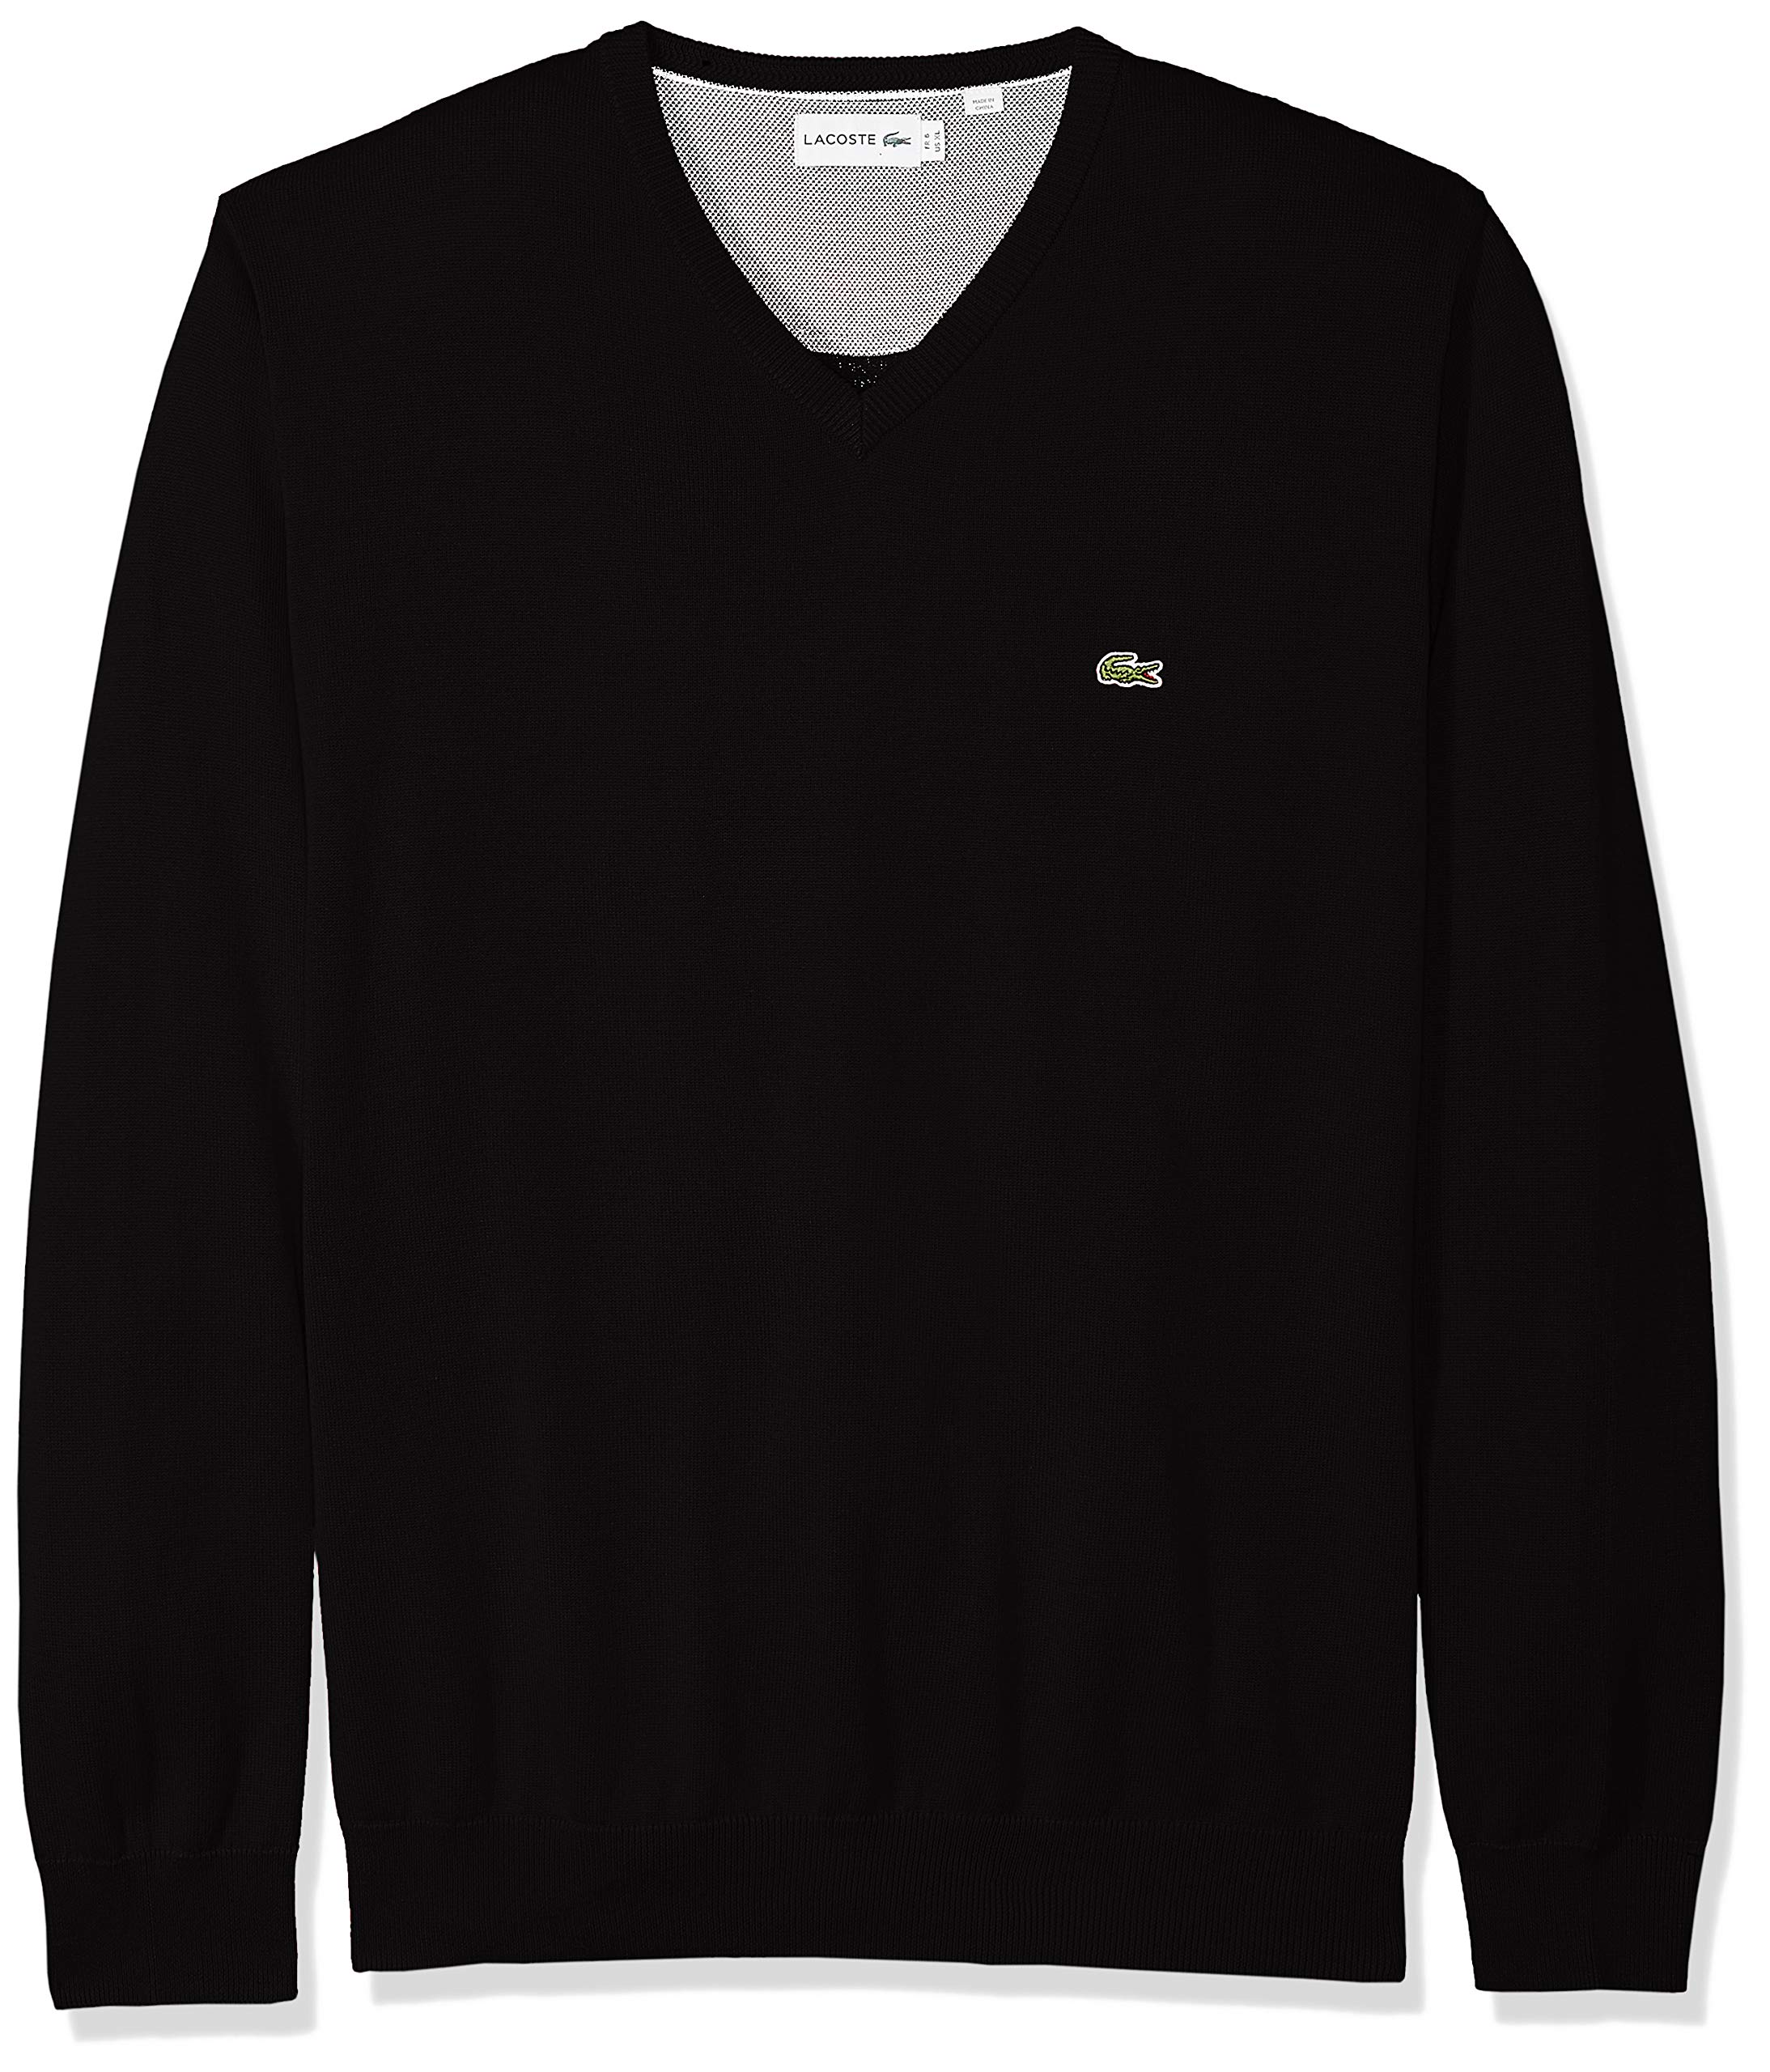 Lacoste Men's Long Sleeve Half Moon V Neck Jersey Sweater, Flour/Black, XX-Large